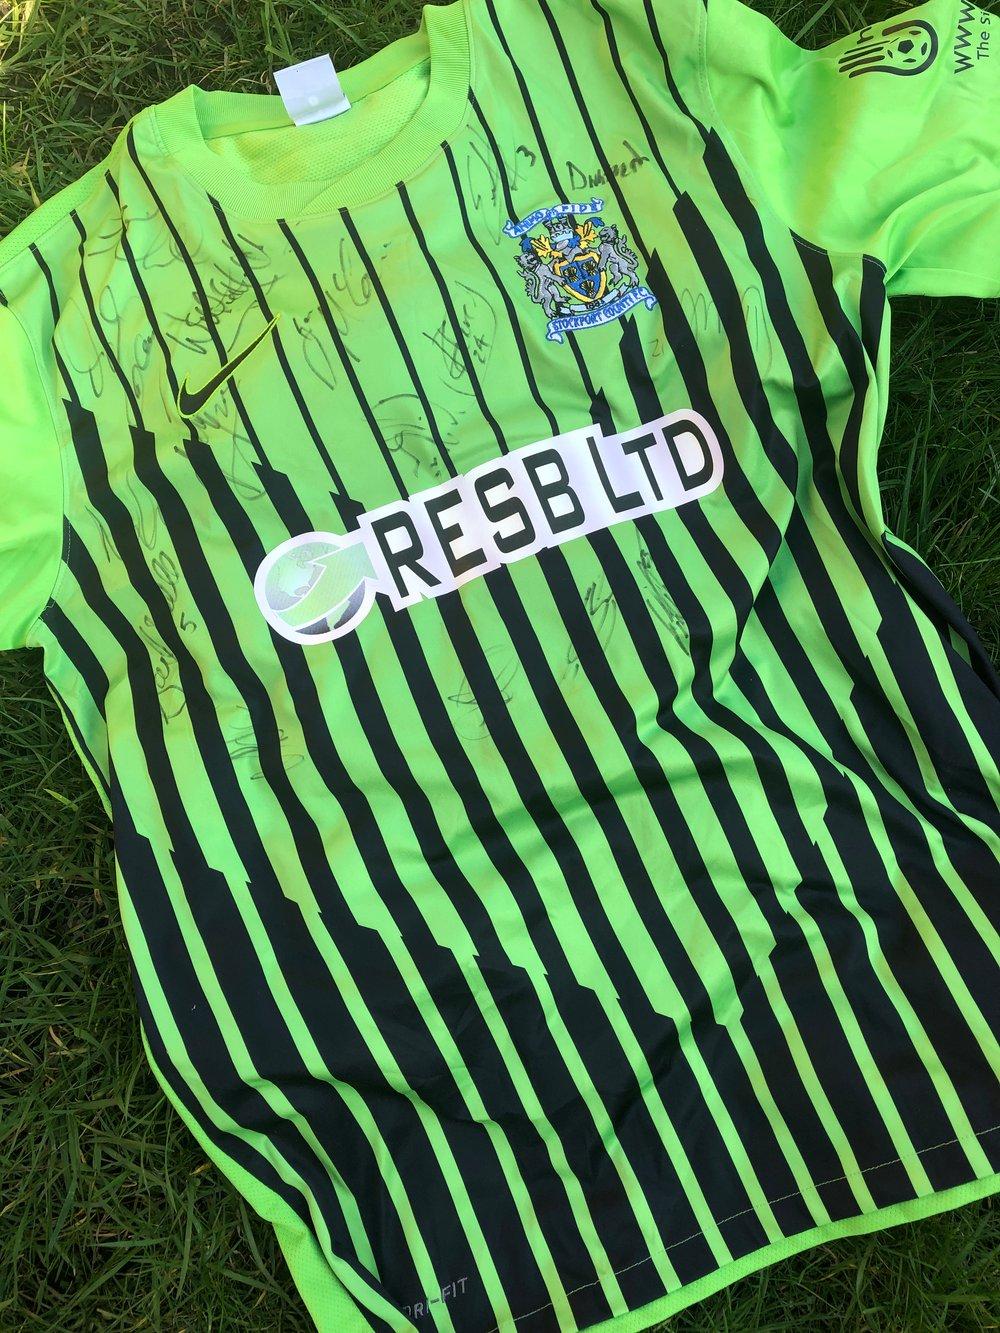 Image of Match worn 2011/12 Nike pre-season home shirt